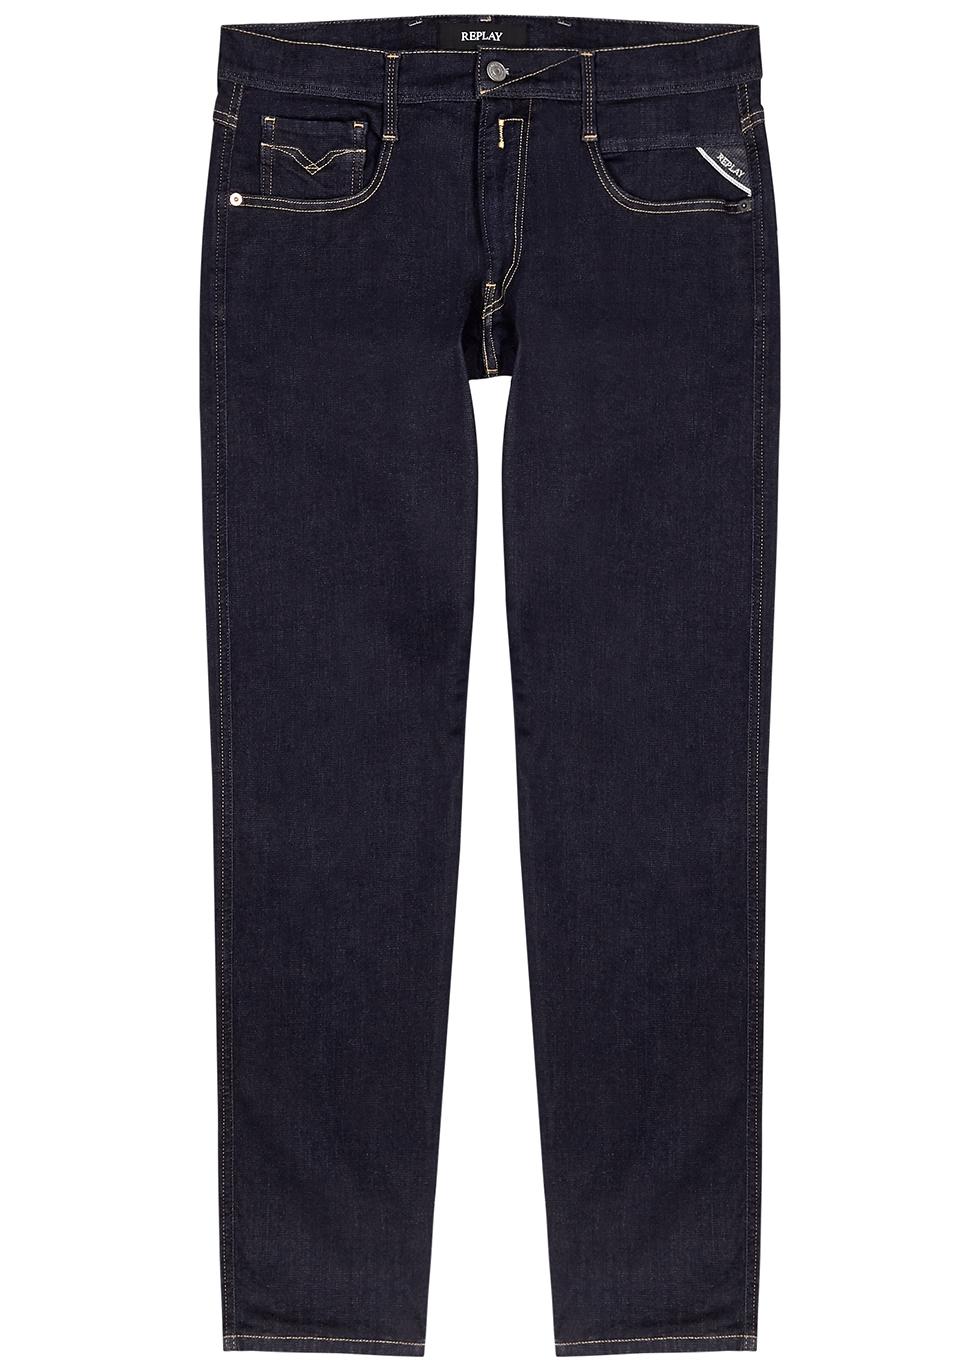 Anbass Hyperflex indigo slim-leg jeans